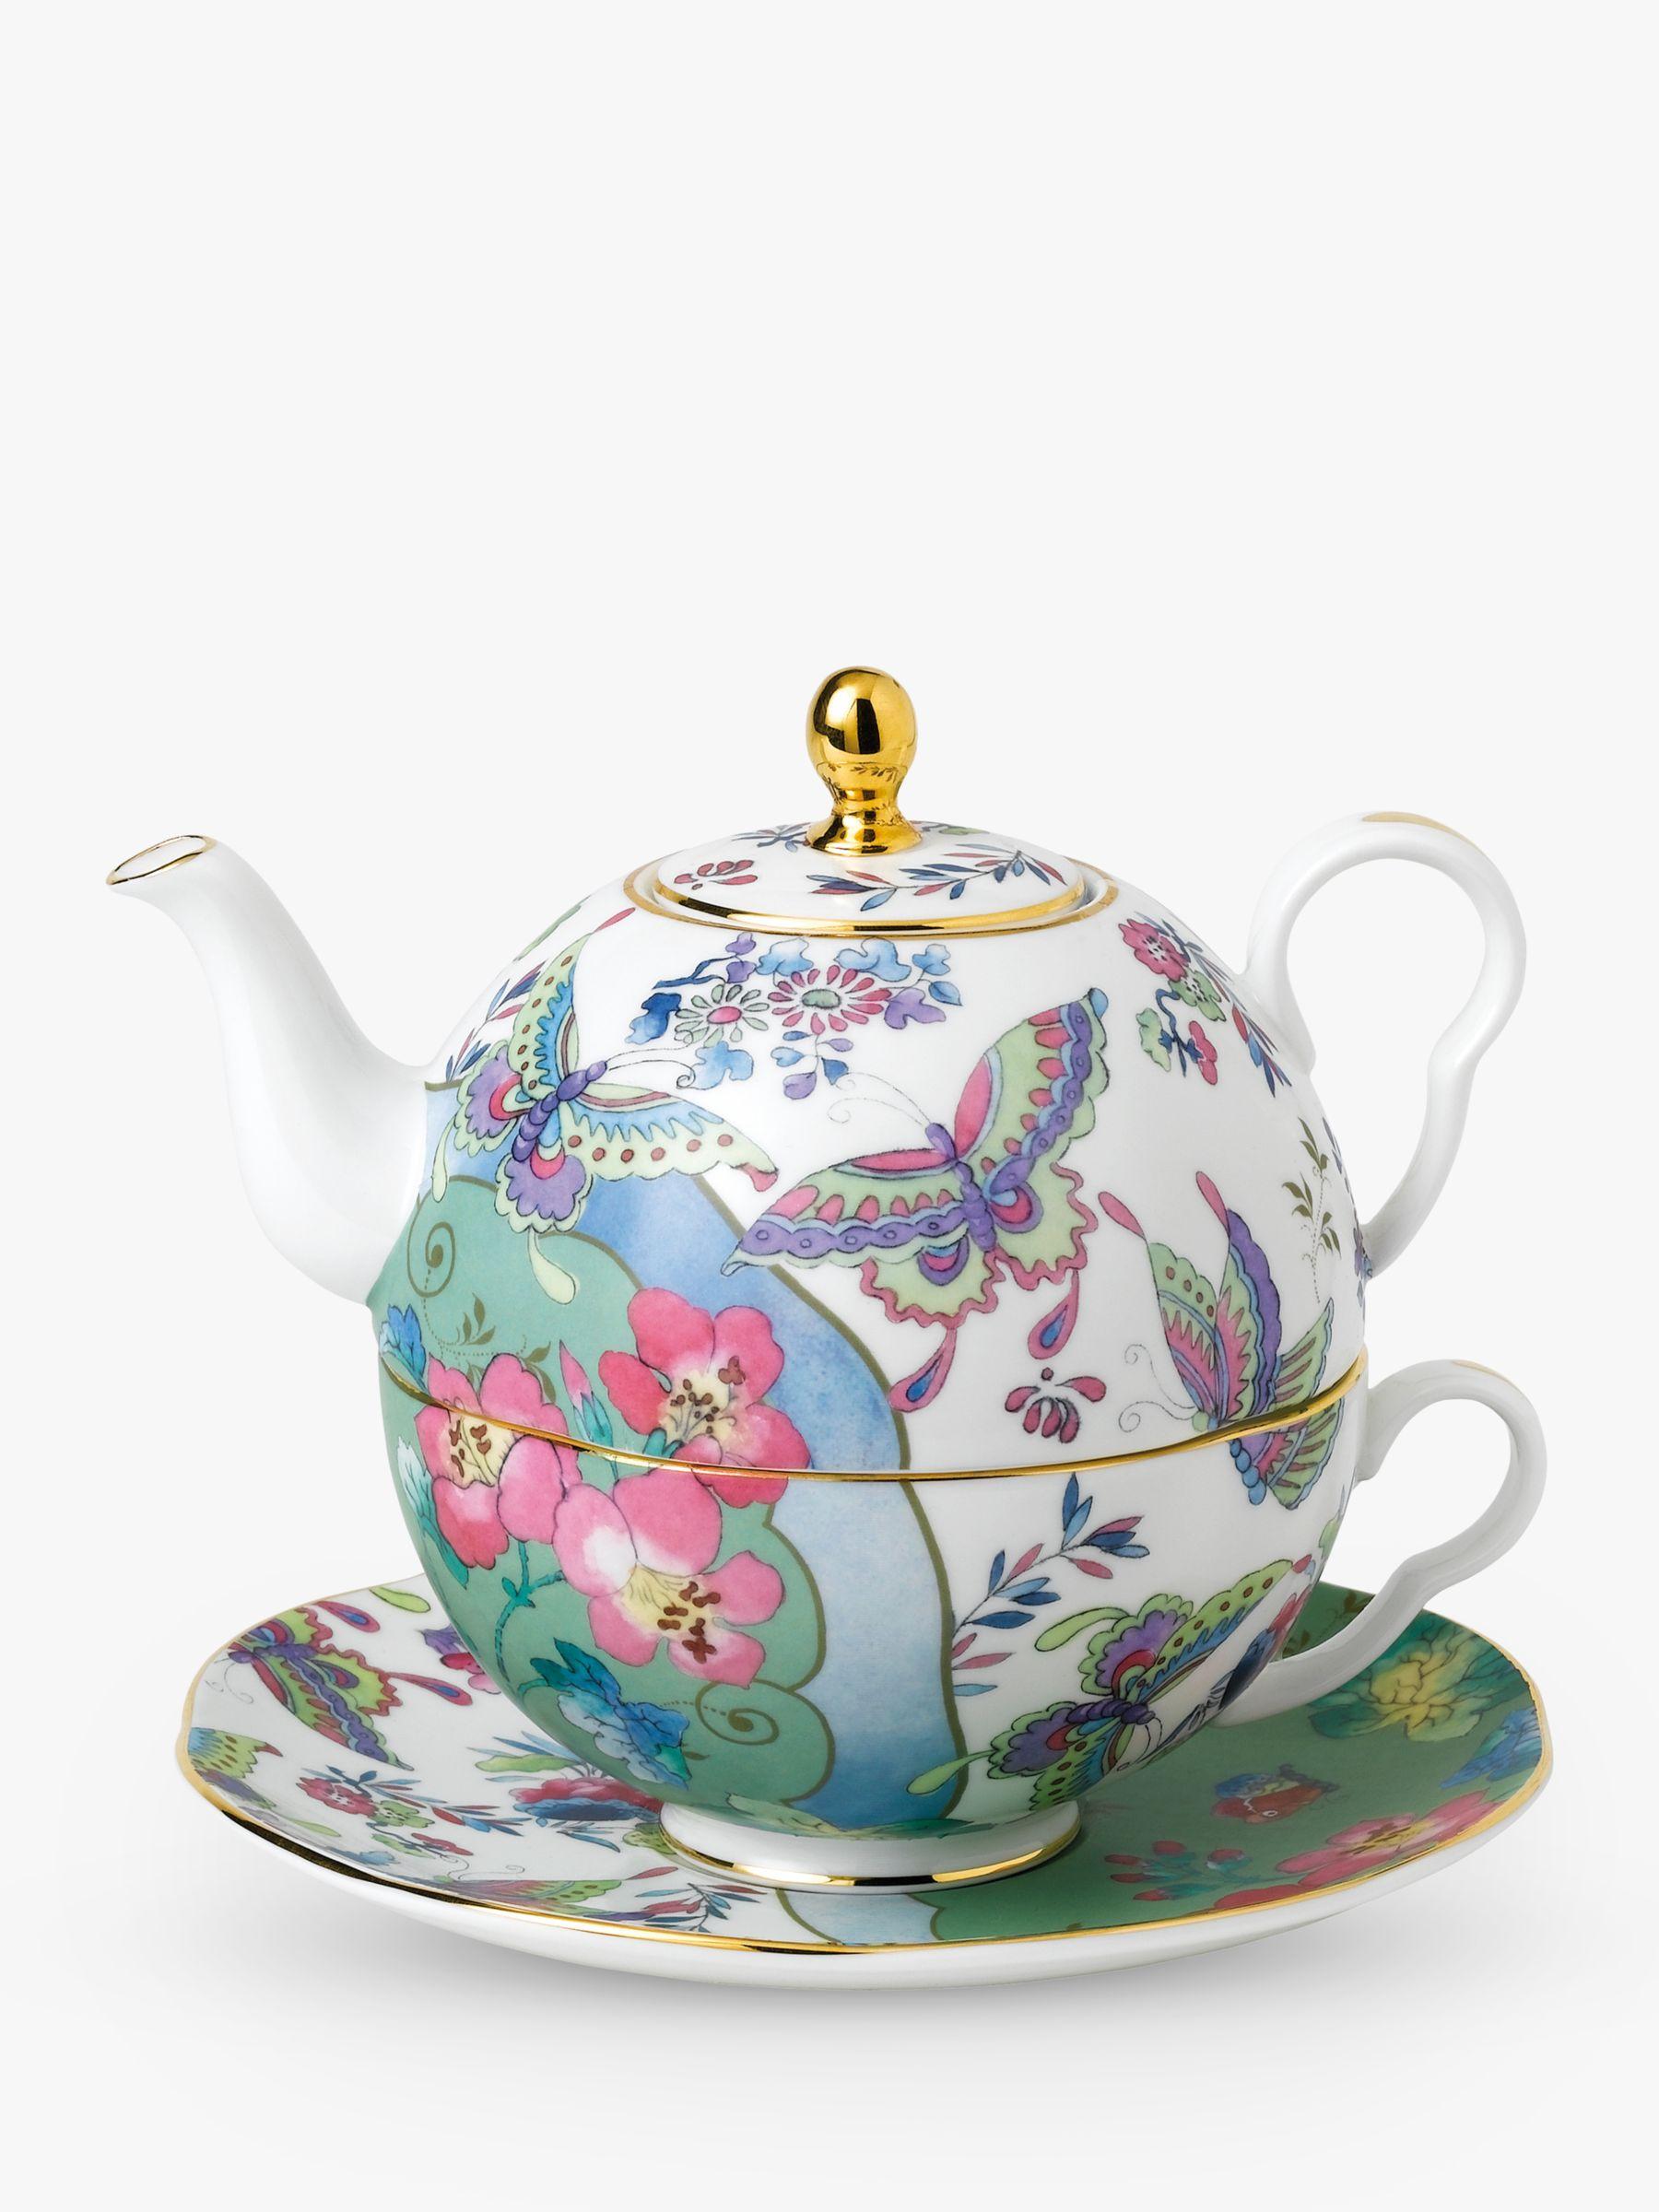 Wedgwood Cuckoo & Butterfly Bloom Tea-For-One Teapot, 940ml, Multi